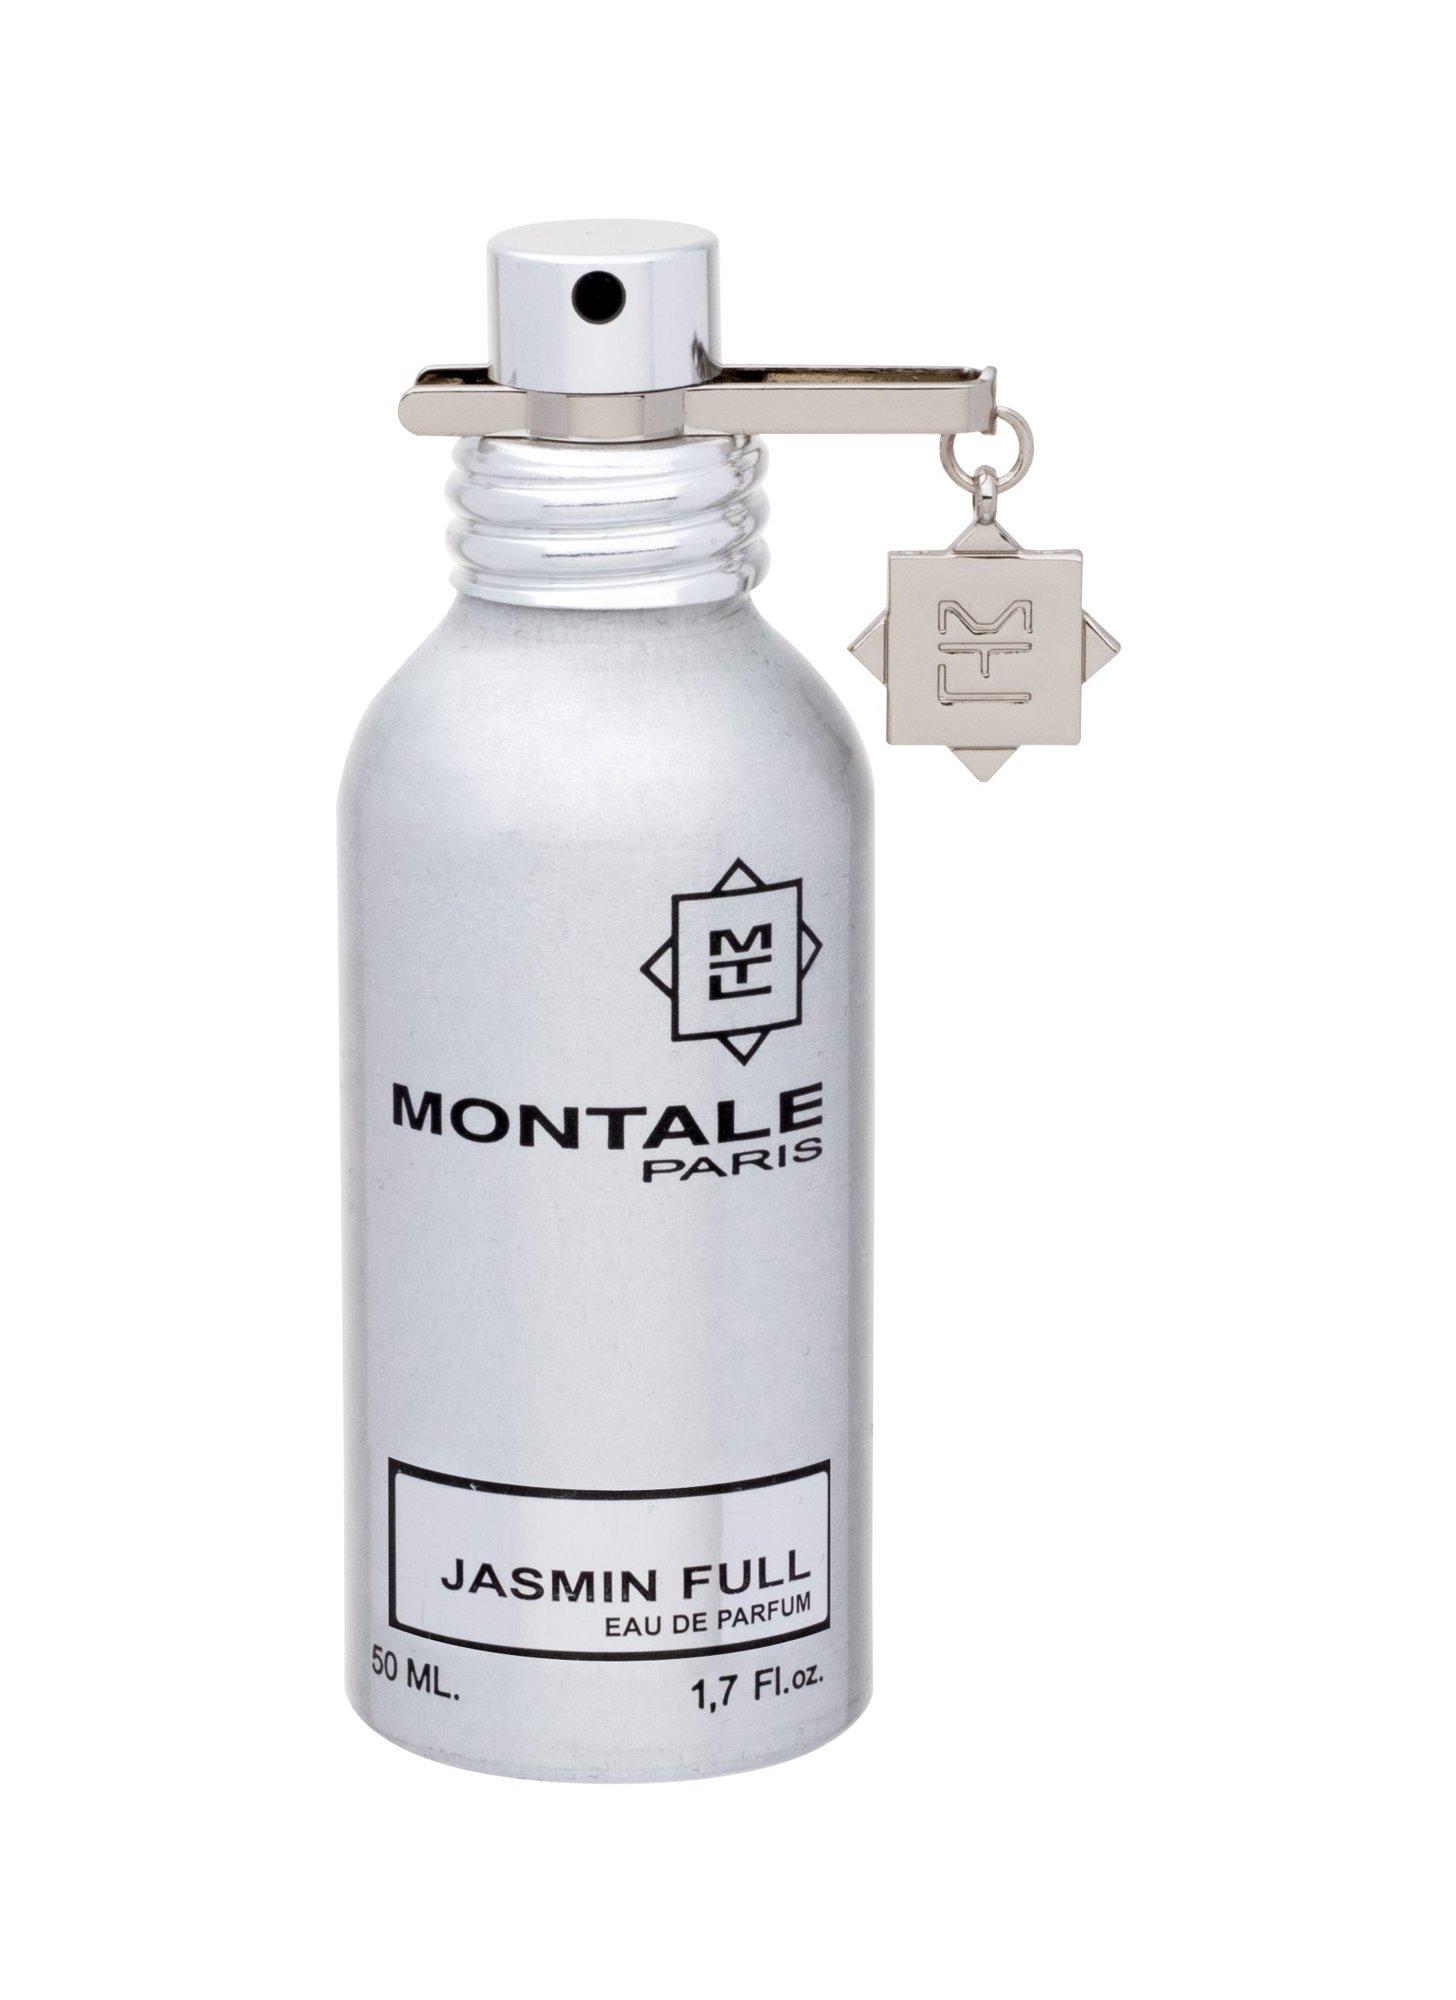 Montale Paris Jasmin Full EDP 50ml